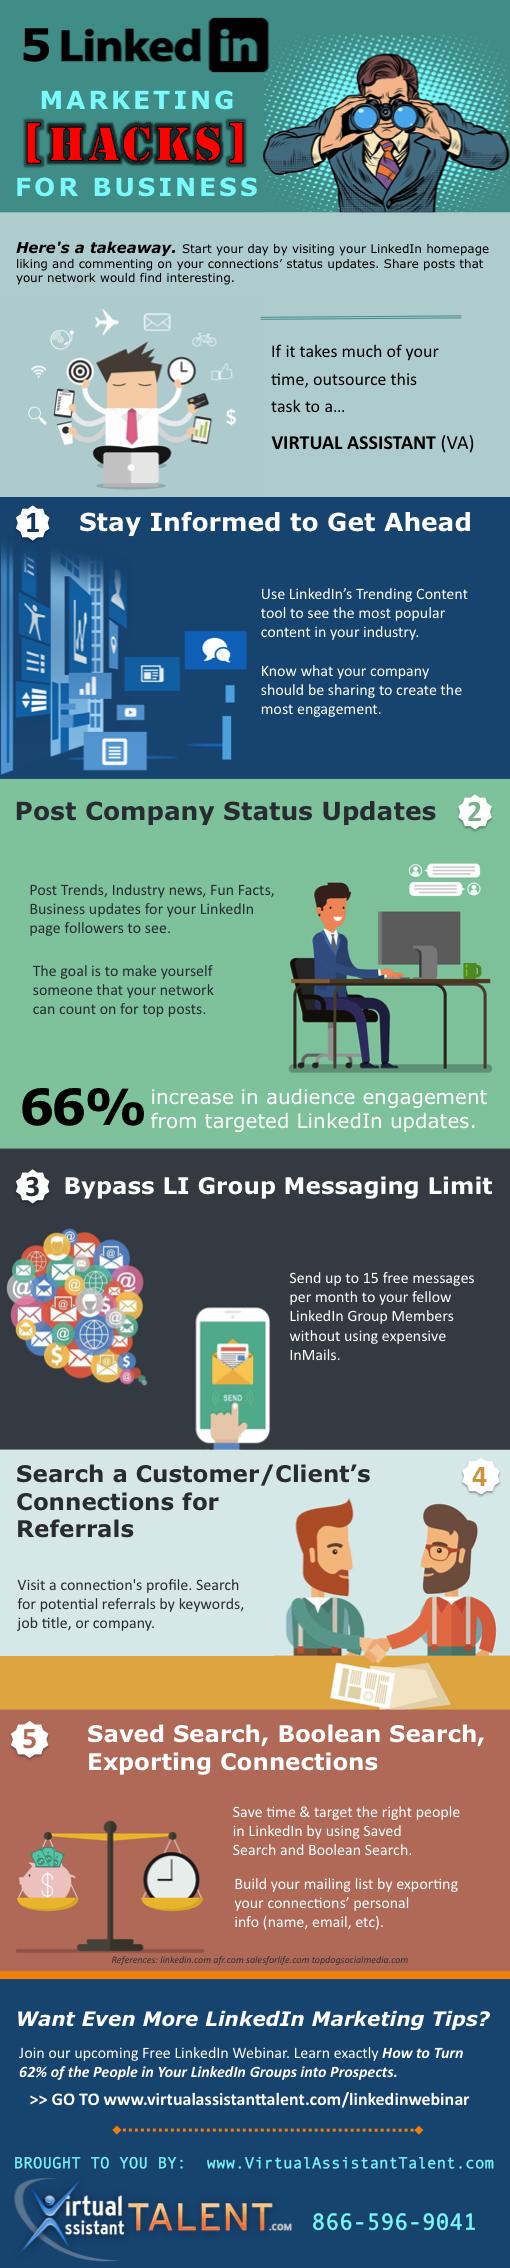 Linkedin Marketing Hacks Business Top Cinci Boost